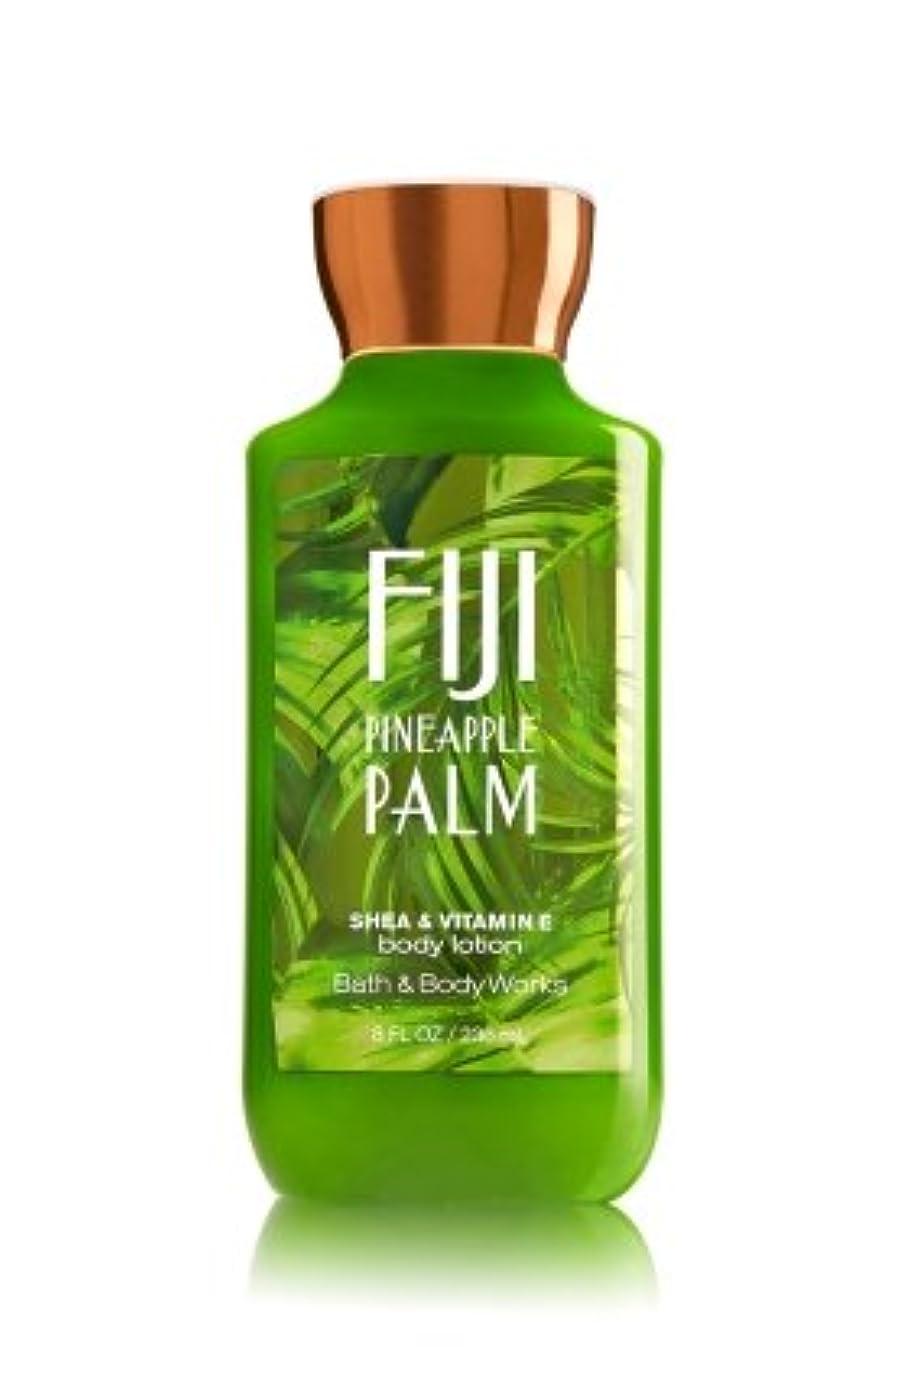 【Bath&Body Works/バス&ボディワークス】 ボディローション フィジーパイナップルパーム Body Lotion Fiji Pineapple Palm 8 fl oz / 236 mL [並行輸入品]